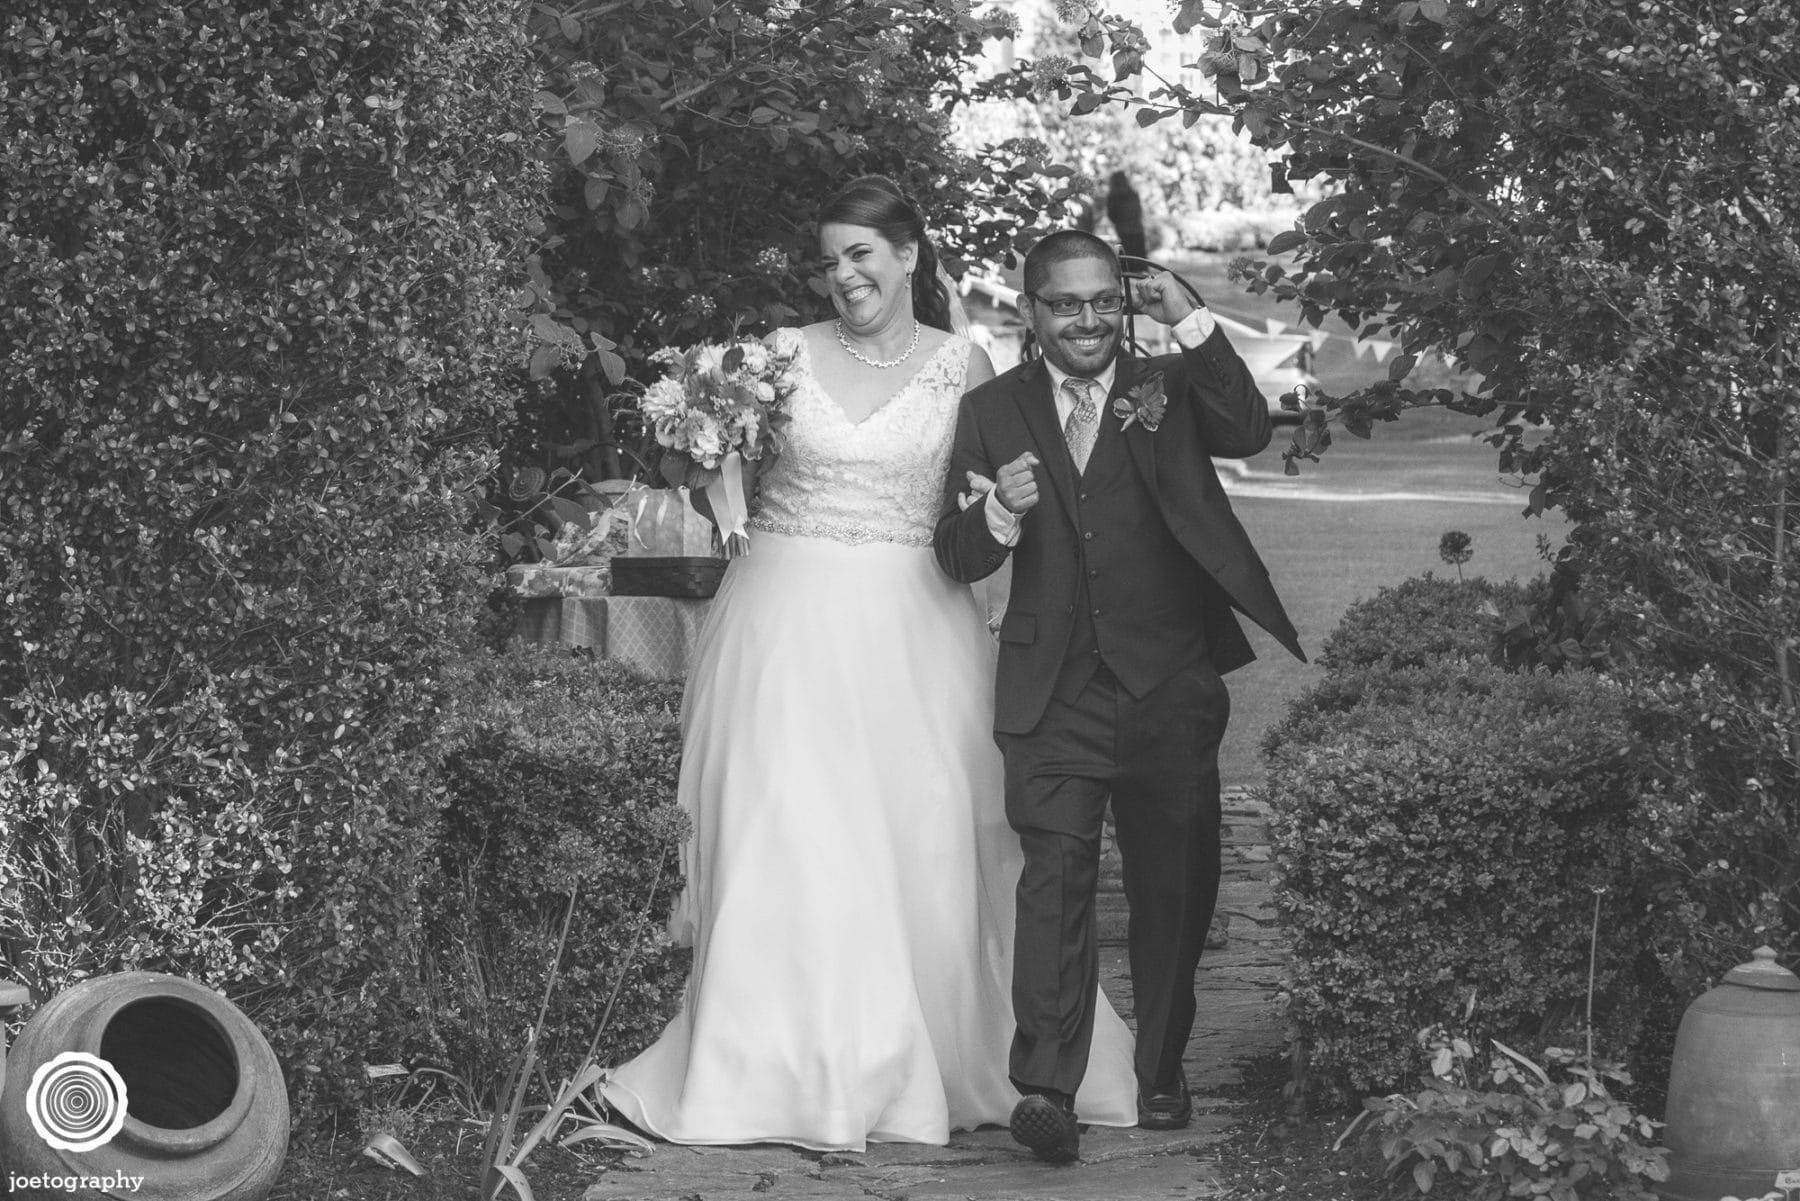 destination-wedding-fairfield-connecticut-438